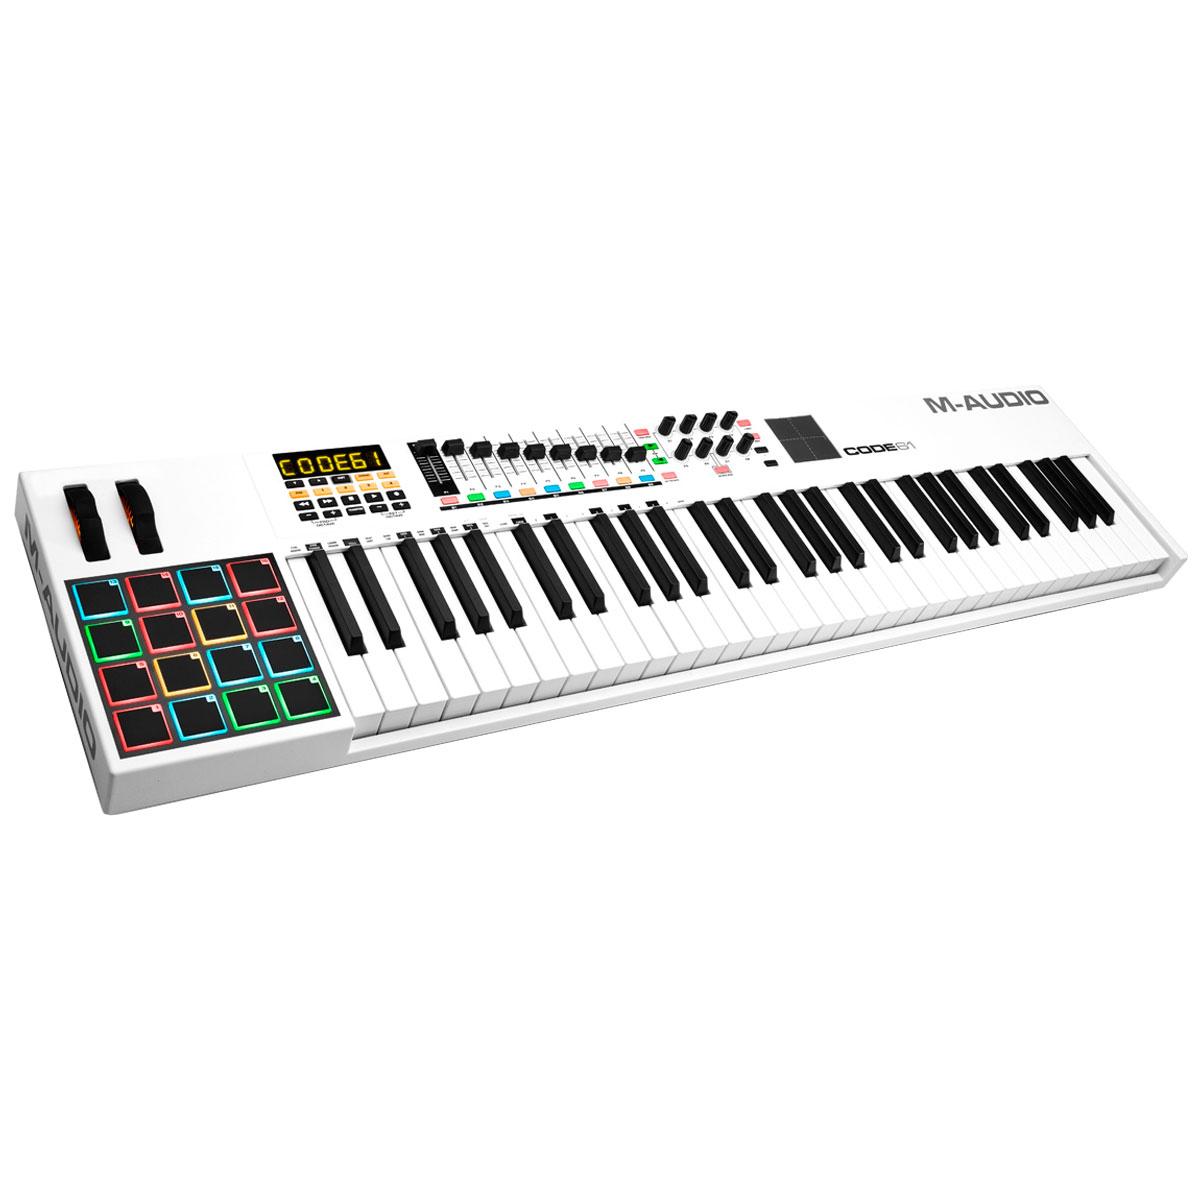 Teclado Controlador MIDI 61 Teclas c/ USB - Code 61 M-Audio